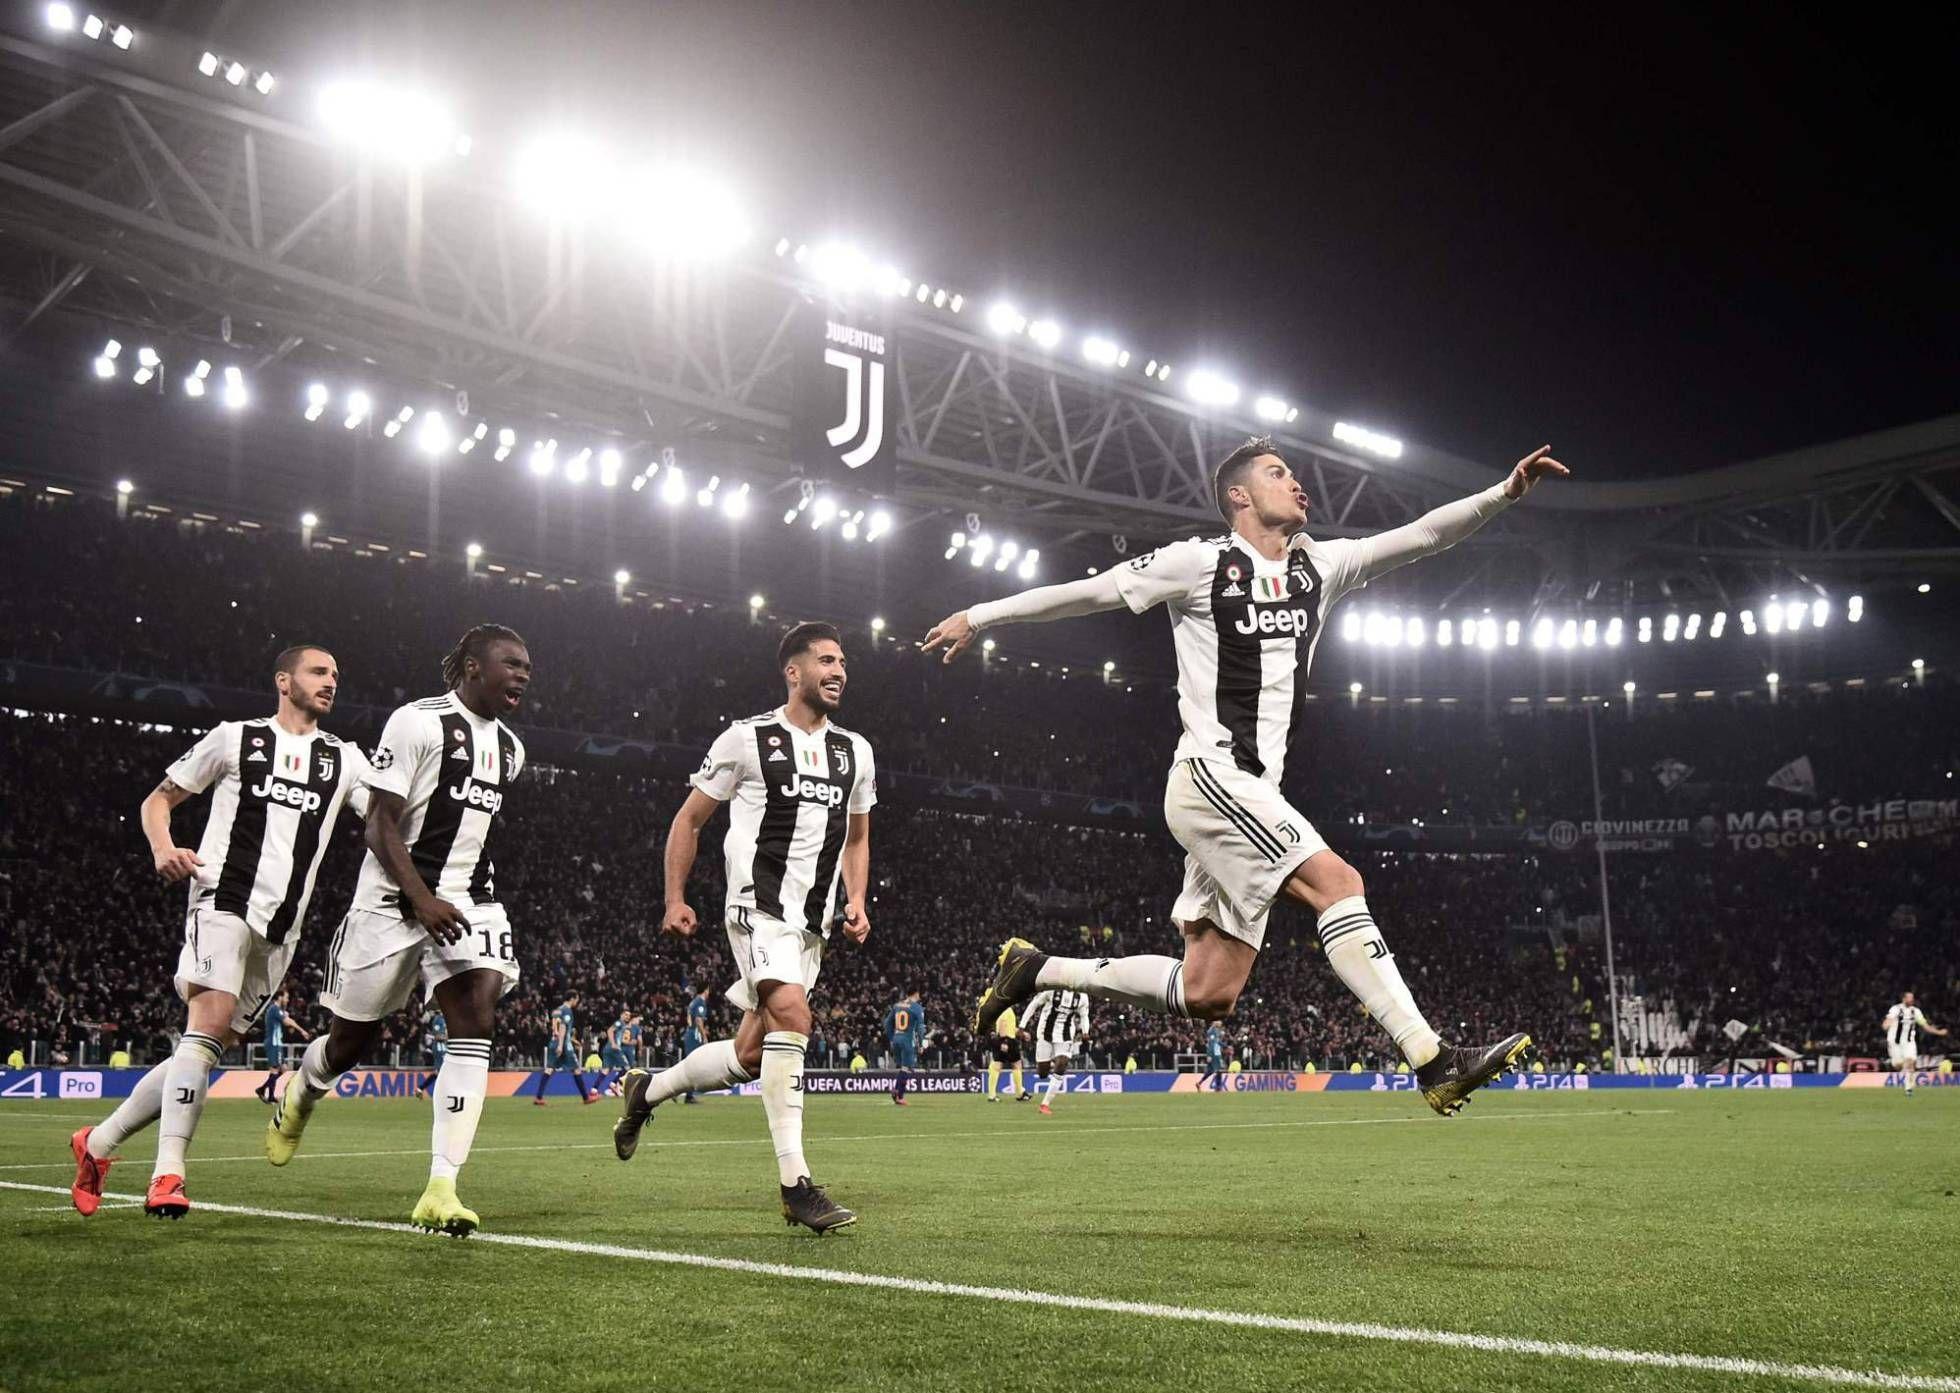 Psbattle Cristiano Ronaldo Celebrating Scoring His Penalty For Juventus In The Uefa Champions League Ronaldo Cristiano Ronaldo Ronaldo Hat Trick